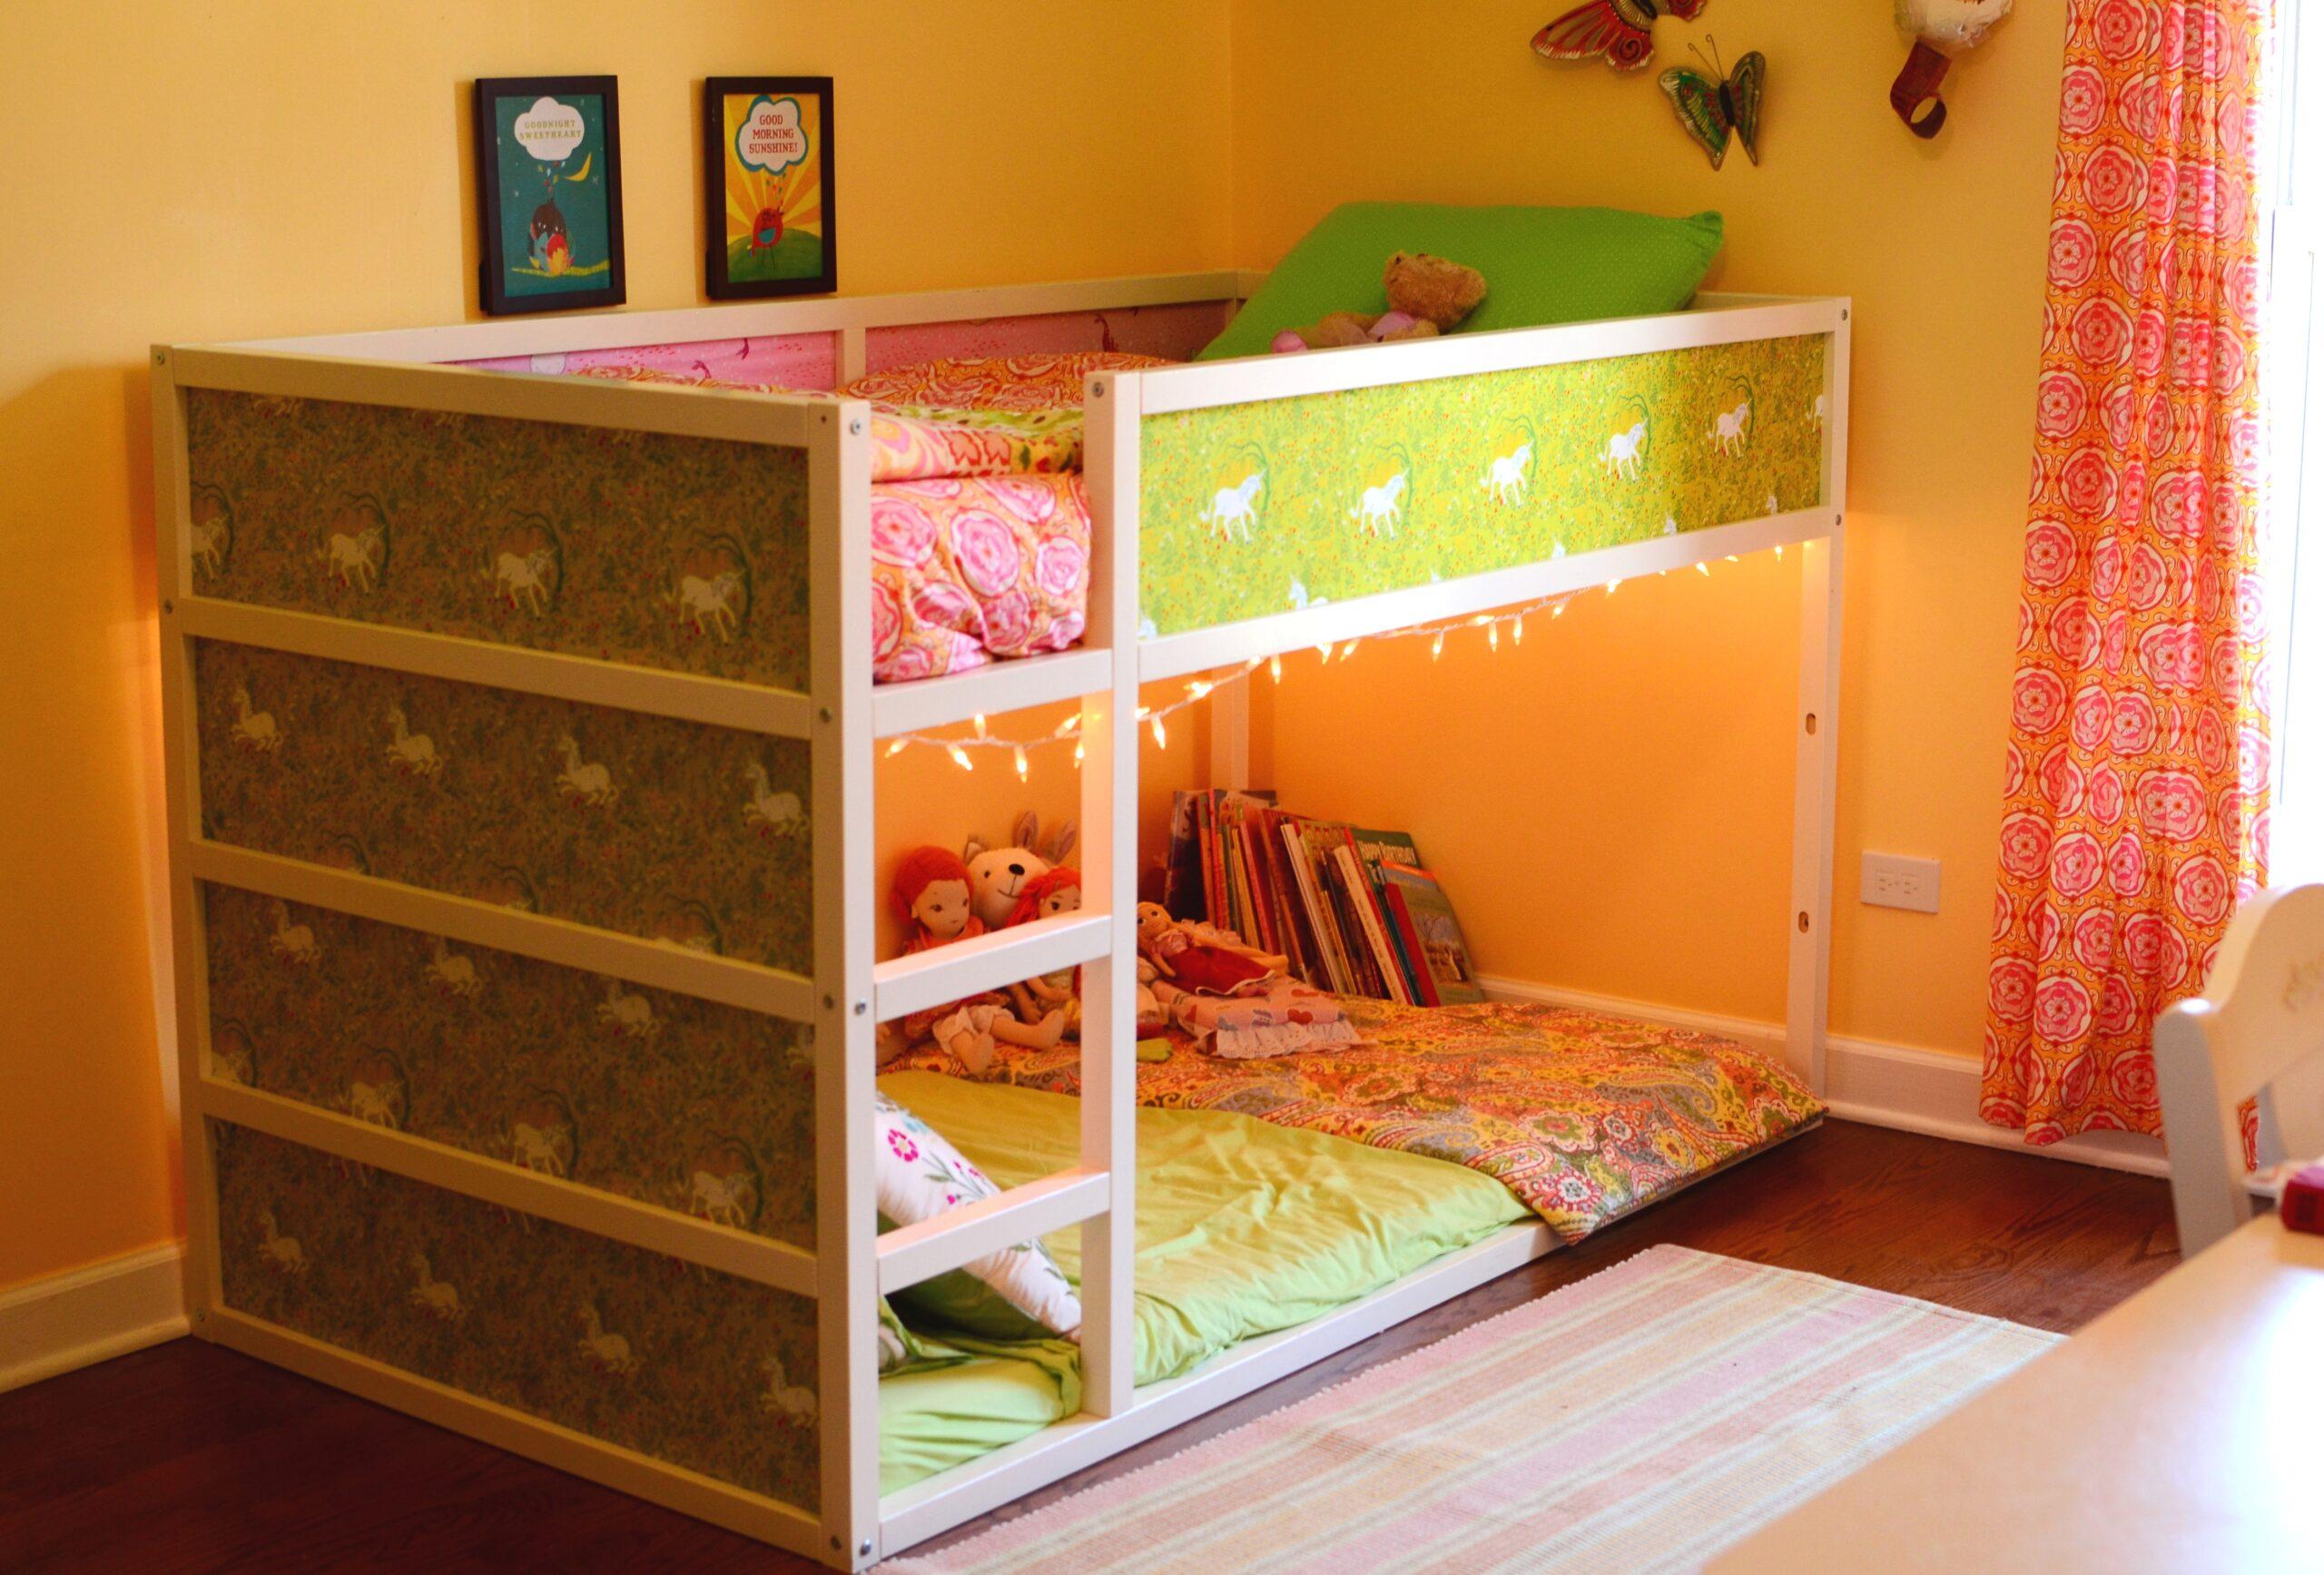 Full Size of Kura Hack Bed Storage Ideas Montessori Ikea Underneath Bunk Rosemary Mornings Wohnzimmer Kura Hack